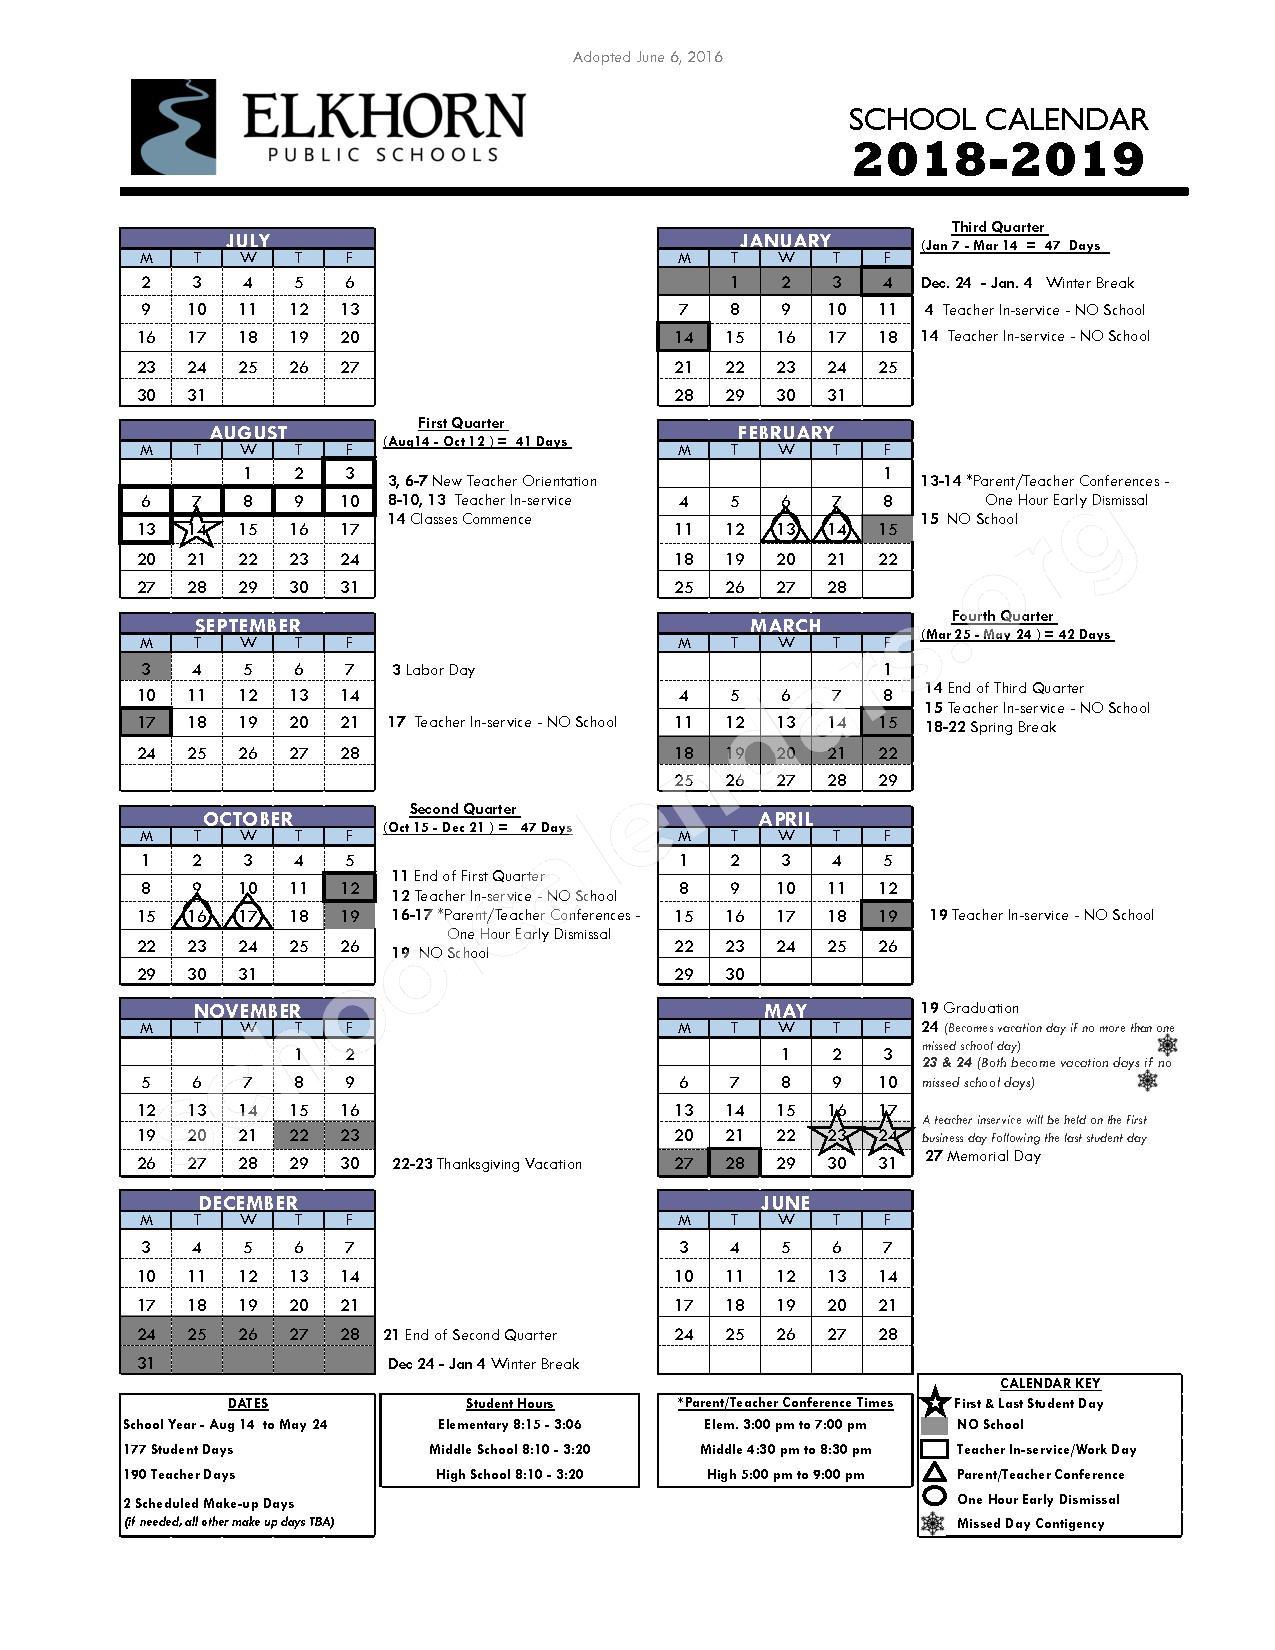 2018 - 2019 District Calendar – Elkhorn Public Schools – page 1